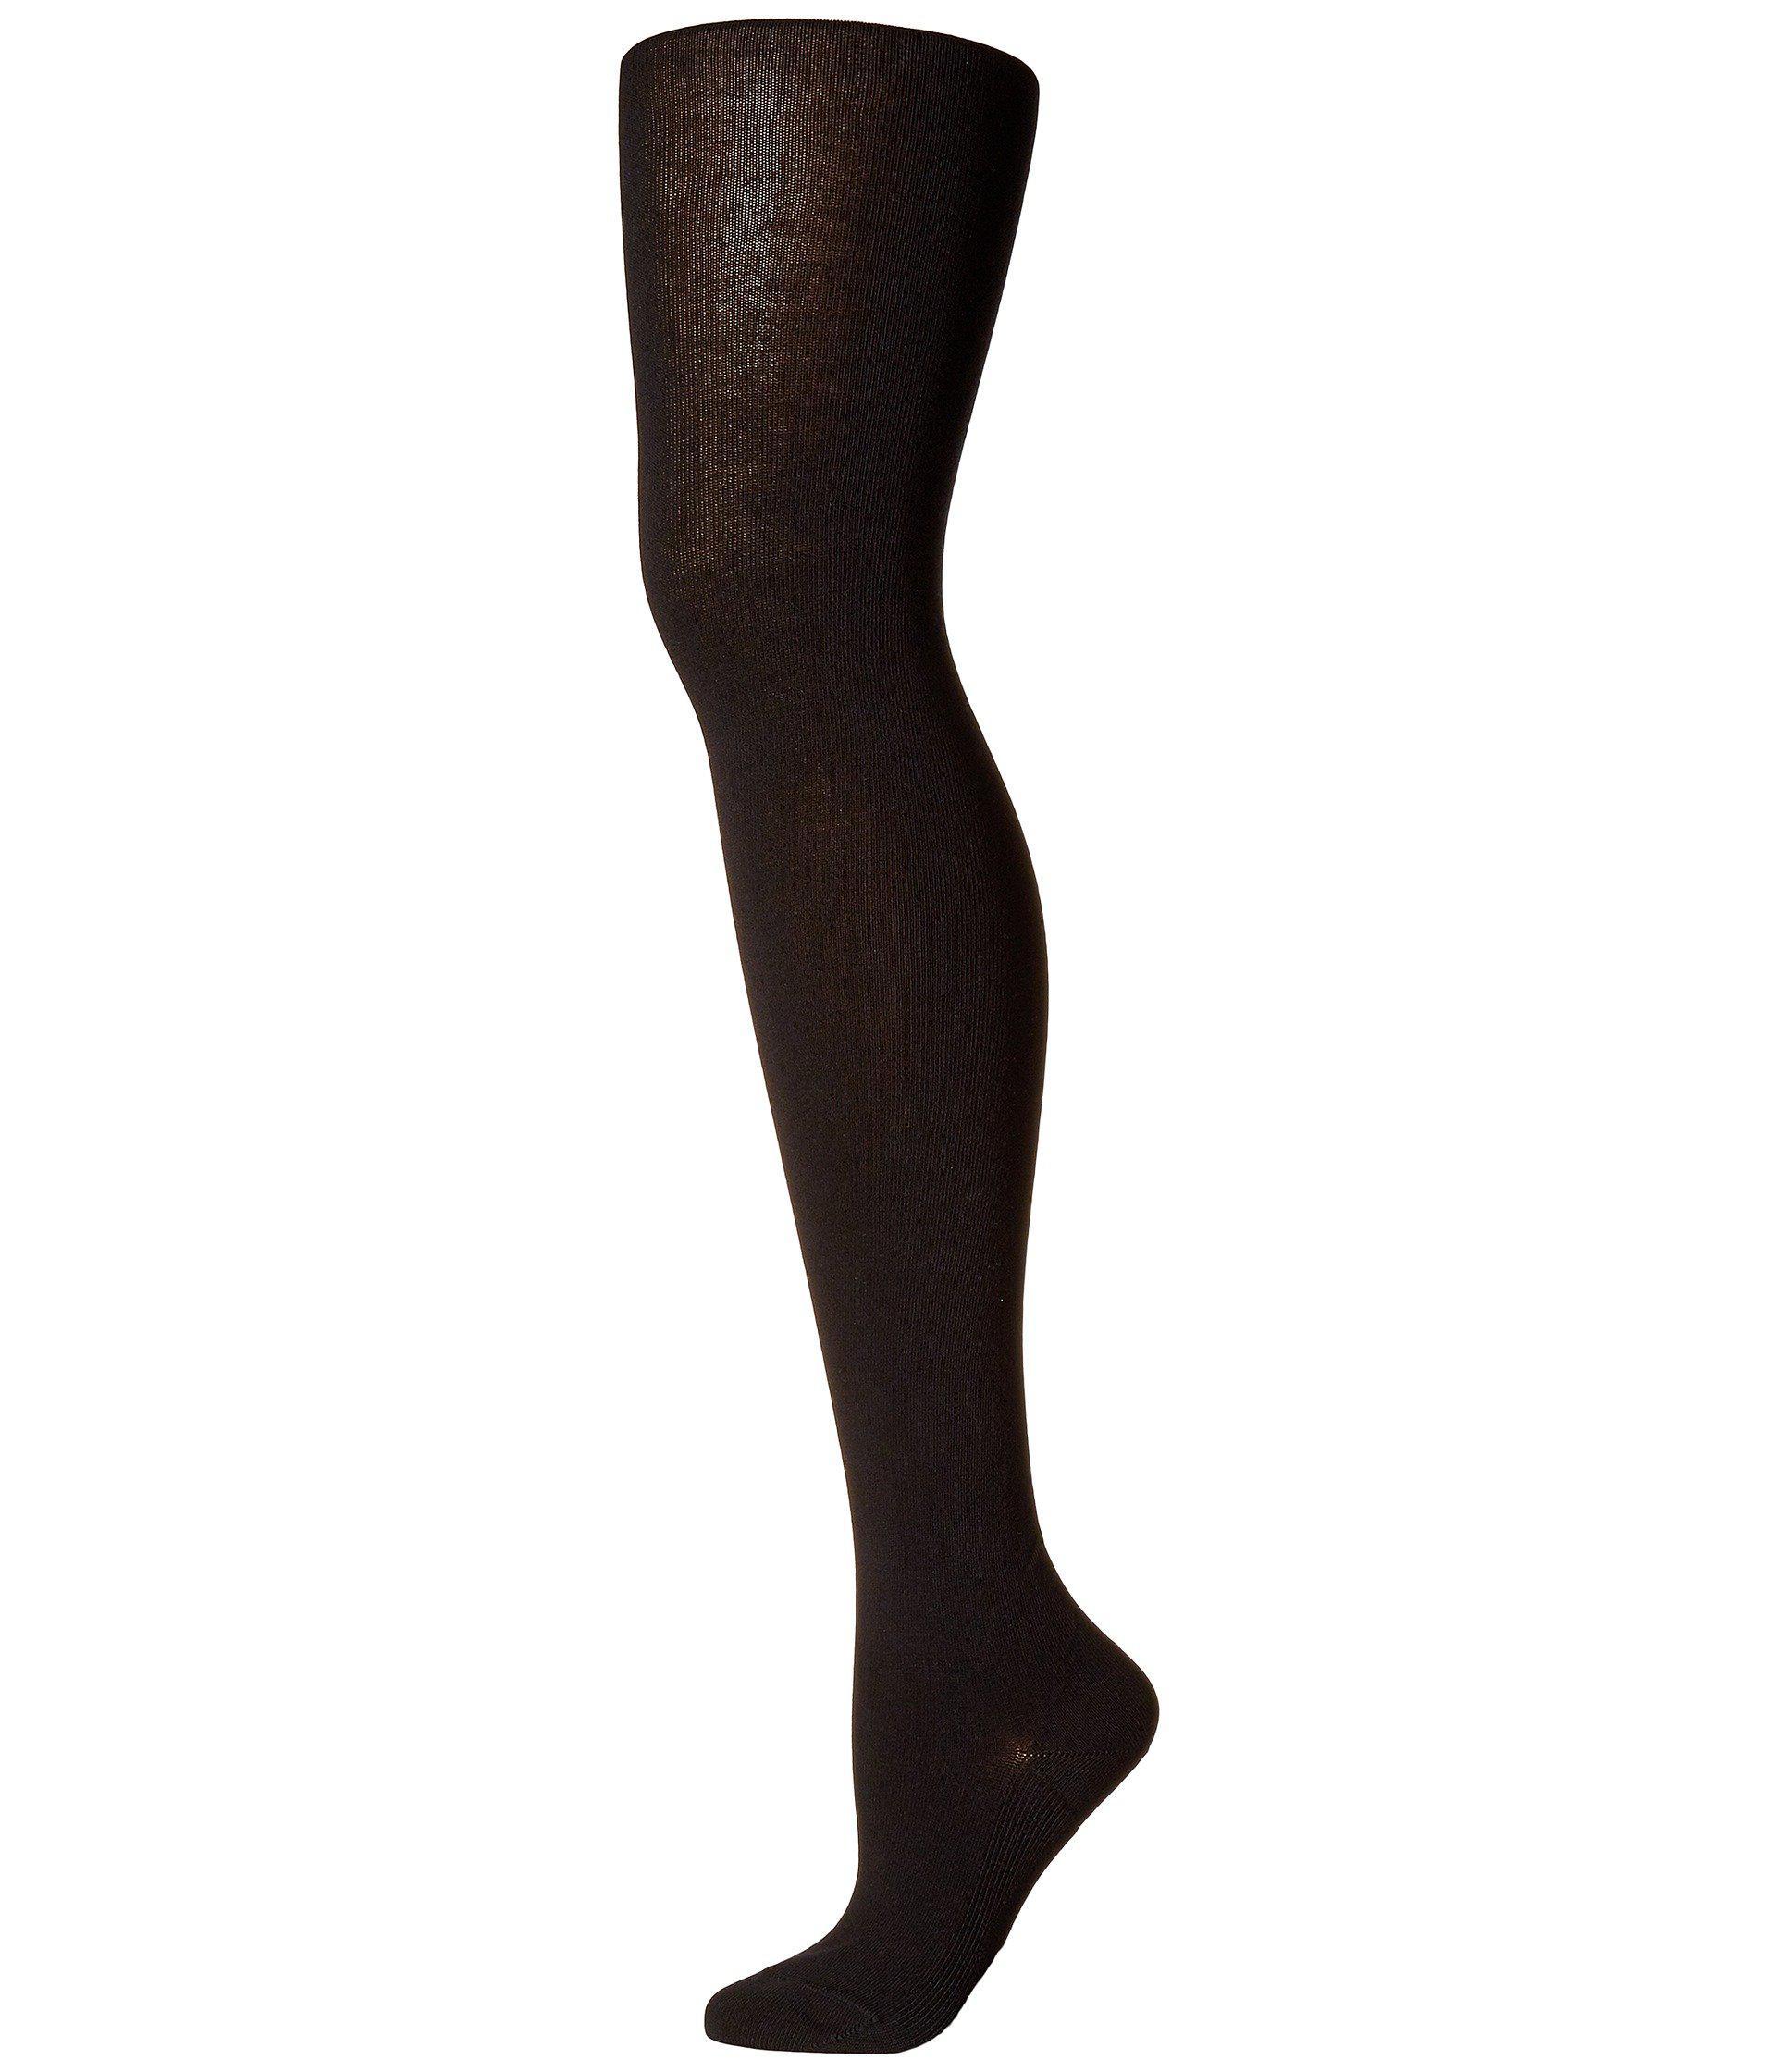 ea25b97e8 Lyst - Falke Family Tights (light Grey) Hose in Black